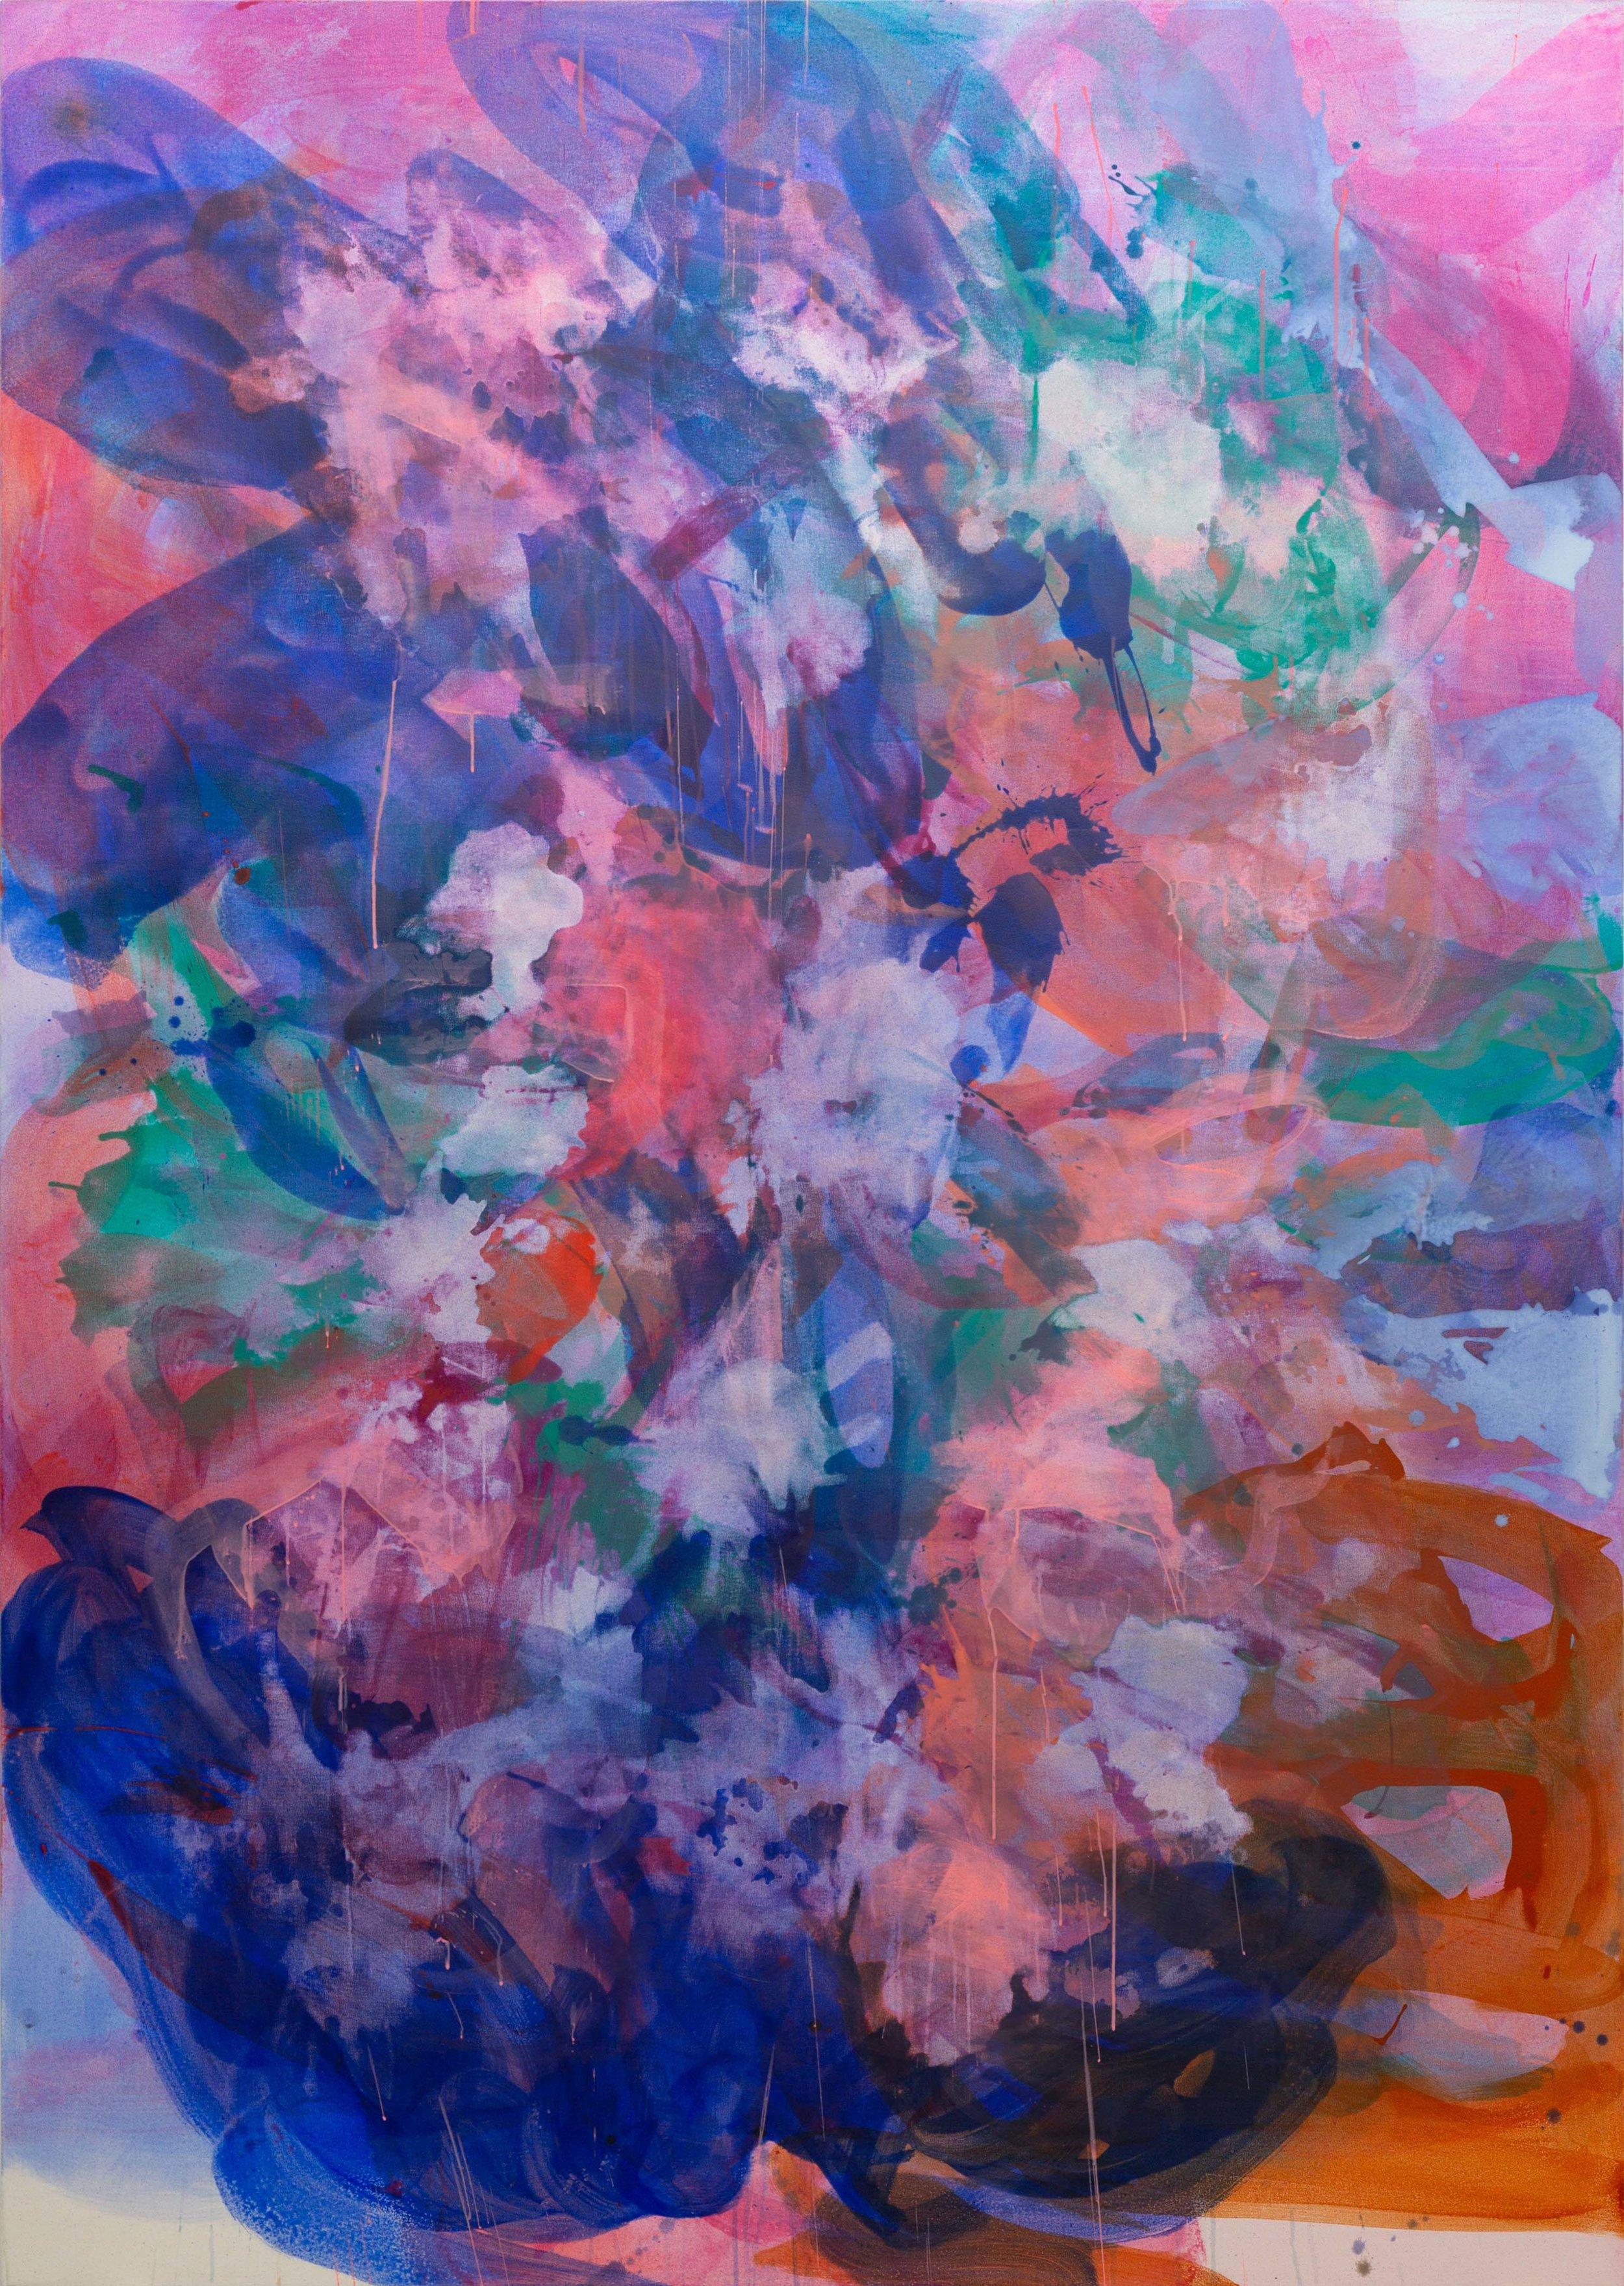 Distemper xl I  2018-2019  distemper on canvas  235.5 x 165 cm